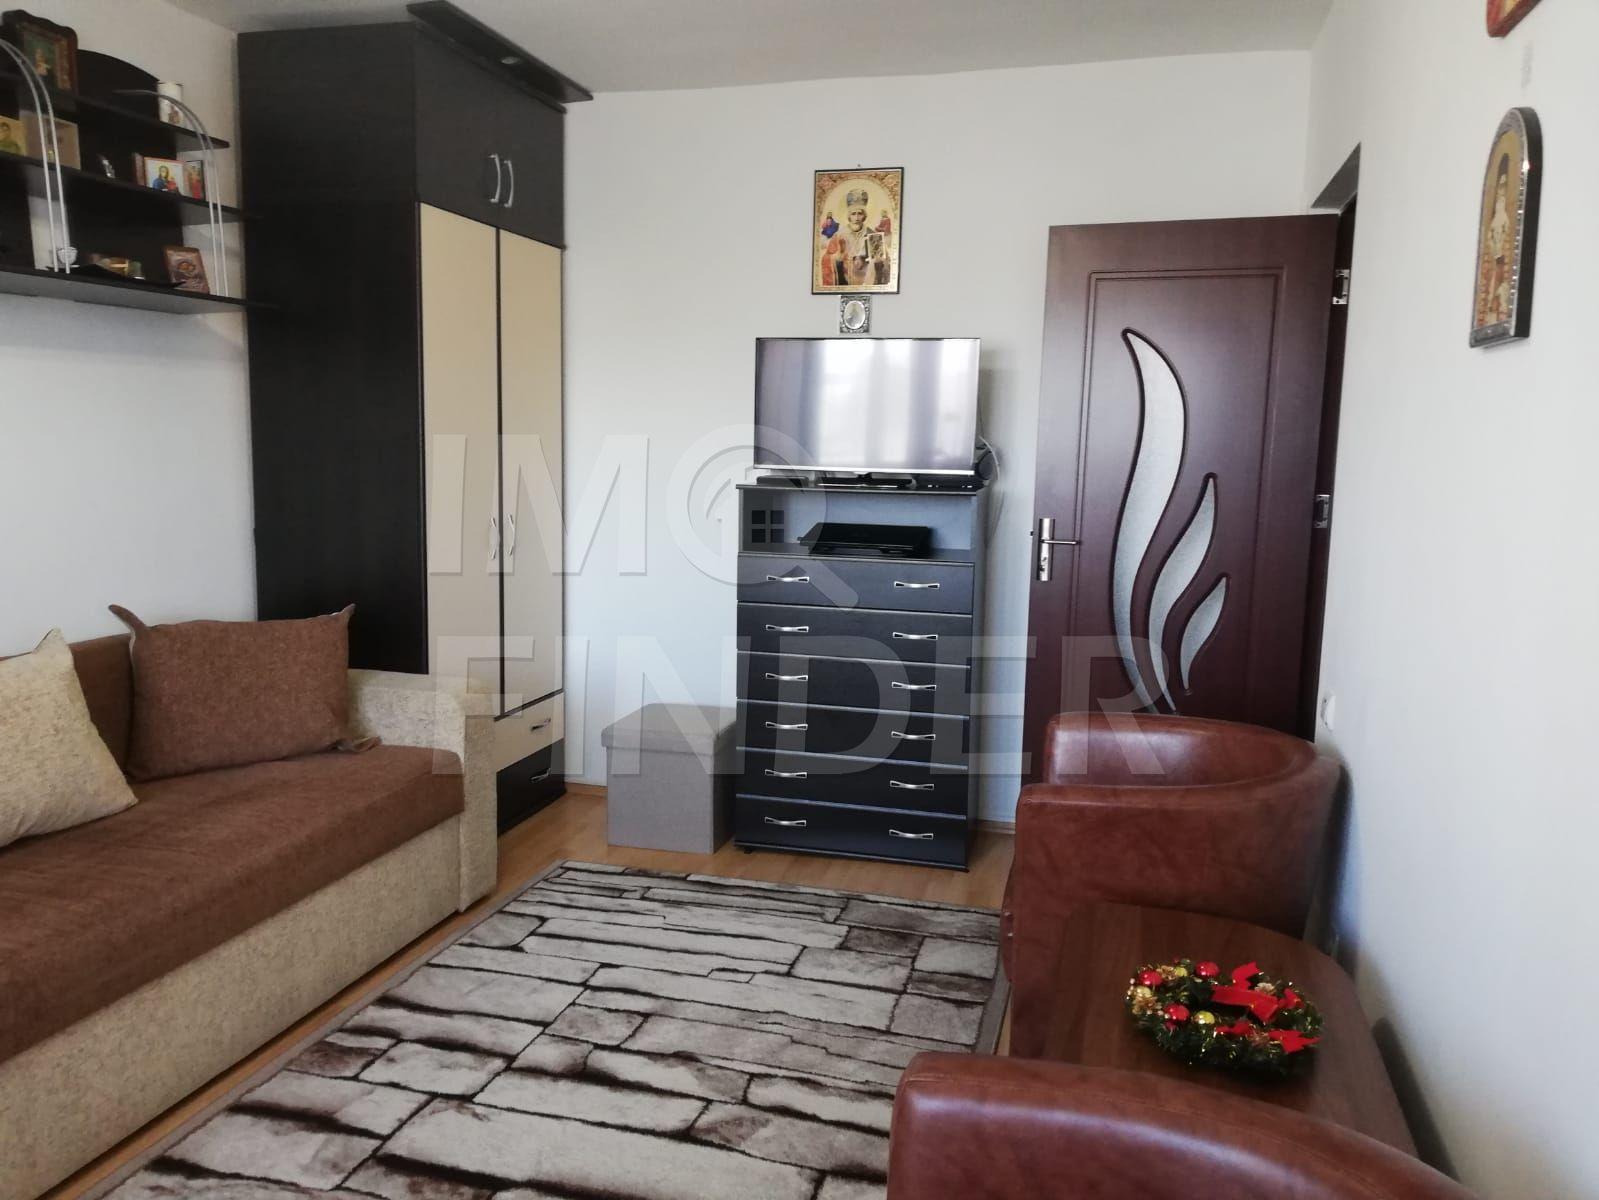 Vanzare o camera, Manastur, zona Primaverii, bloc de apartamente